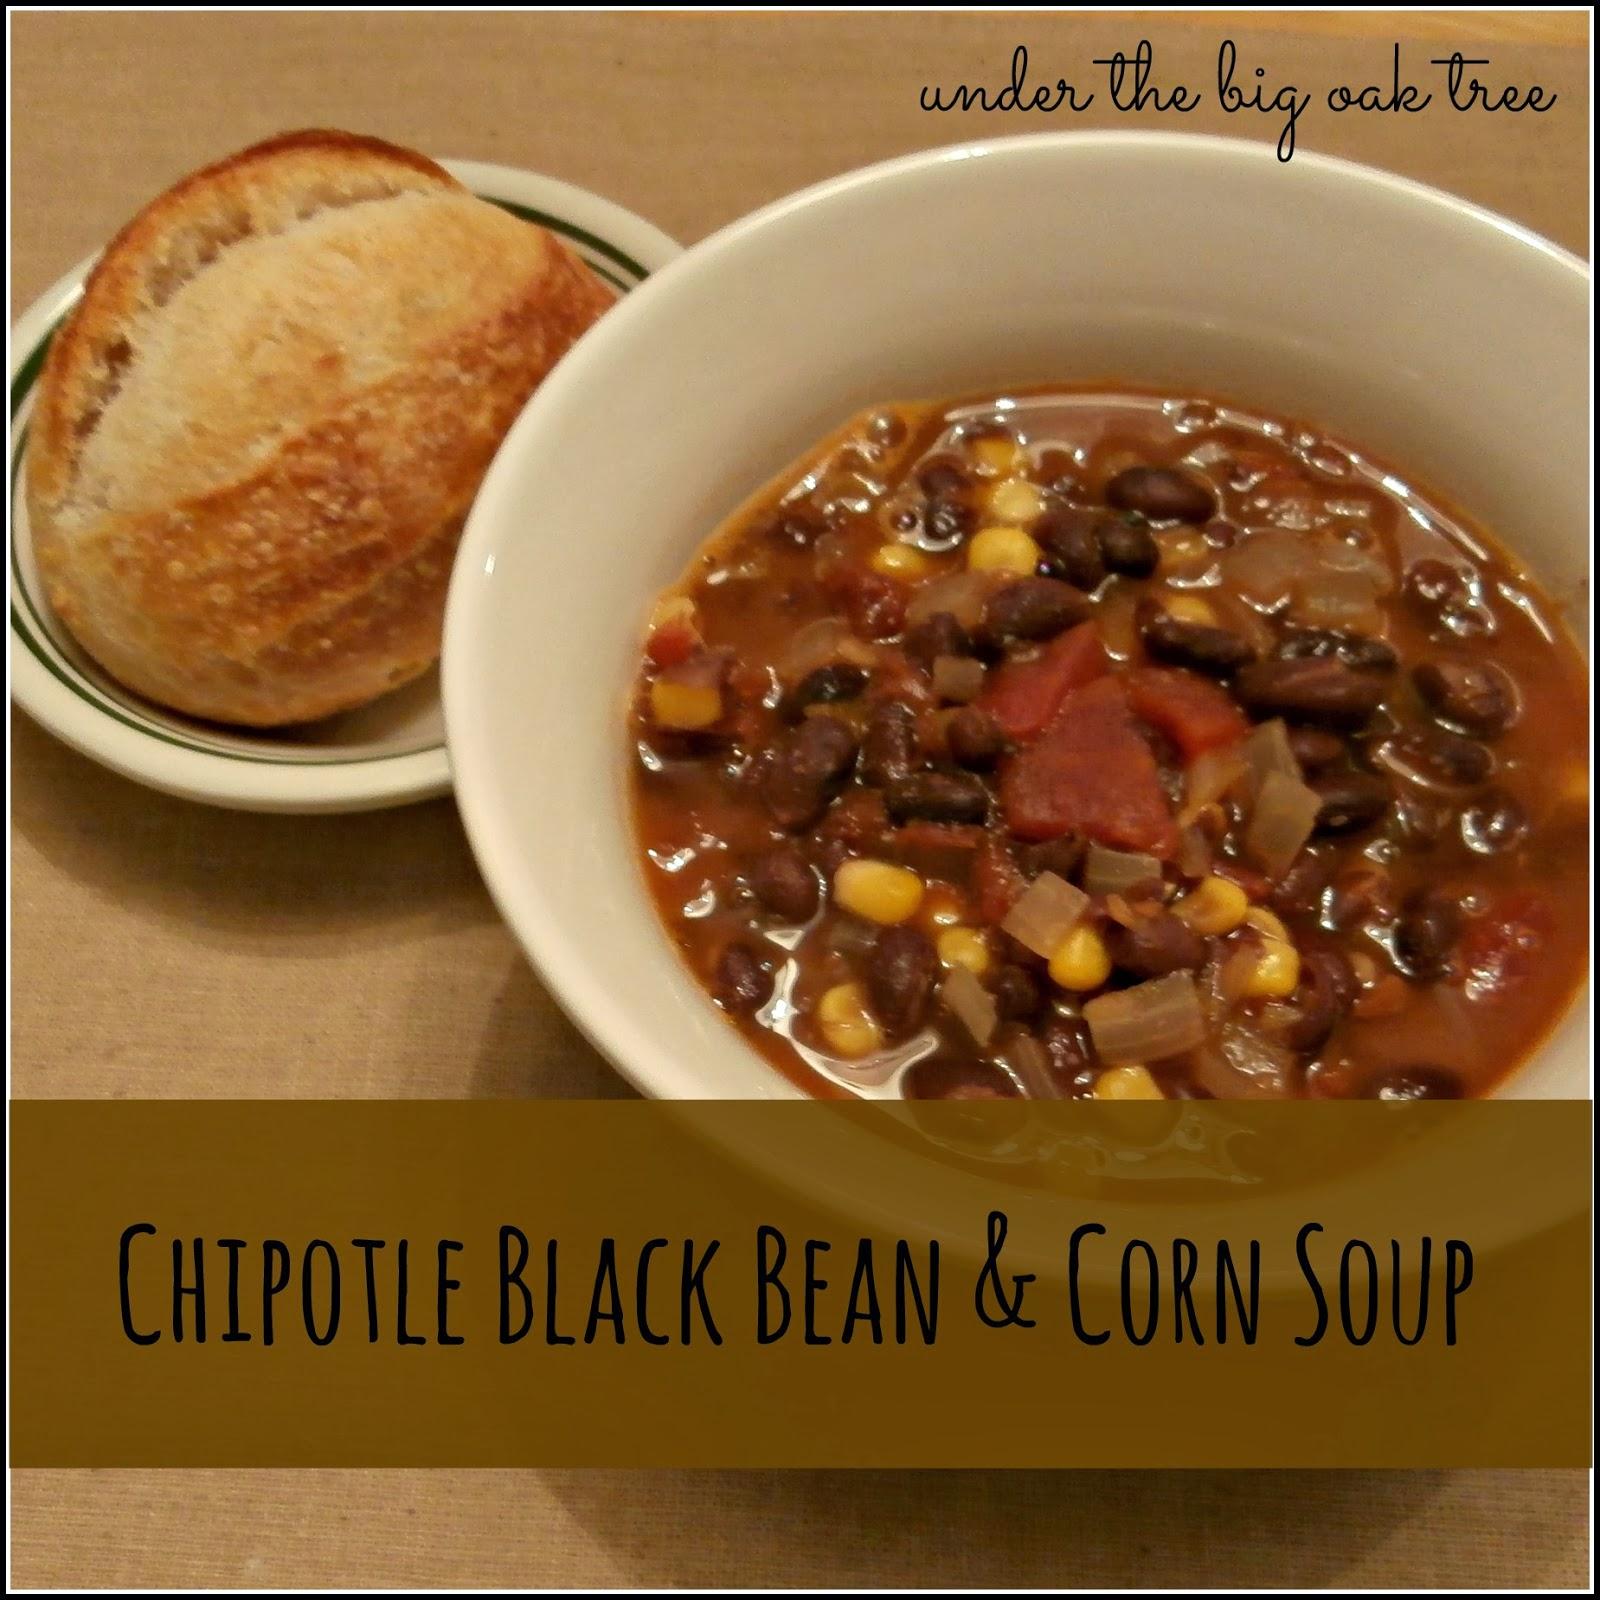 Under the Big Oak Tree: Chipotle Black Bean & Corn Soup